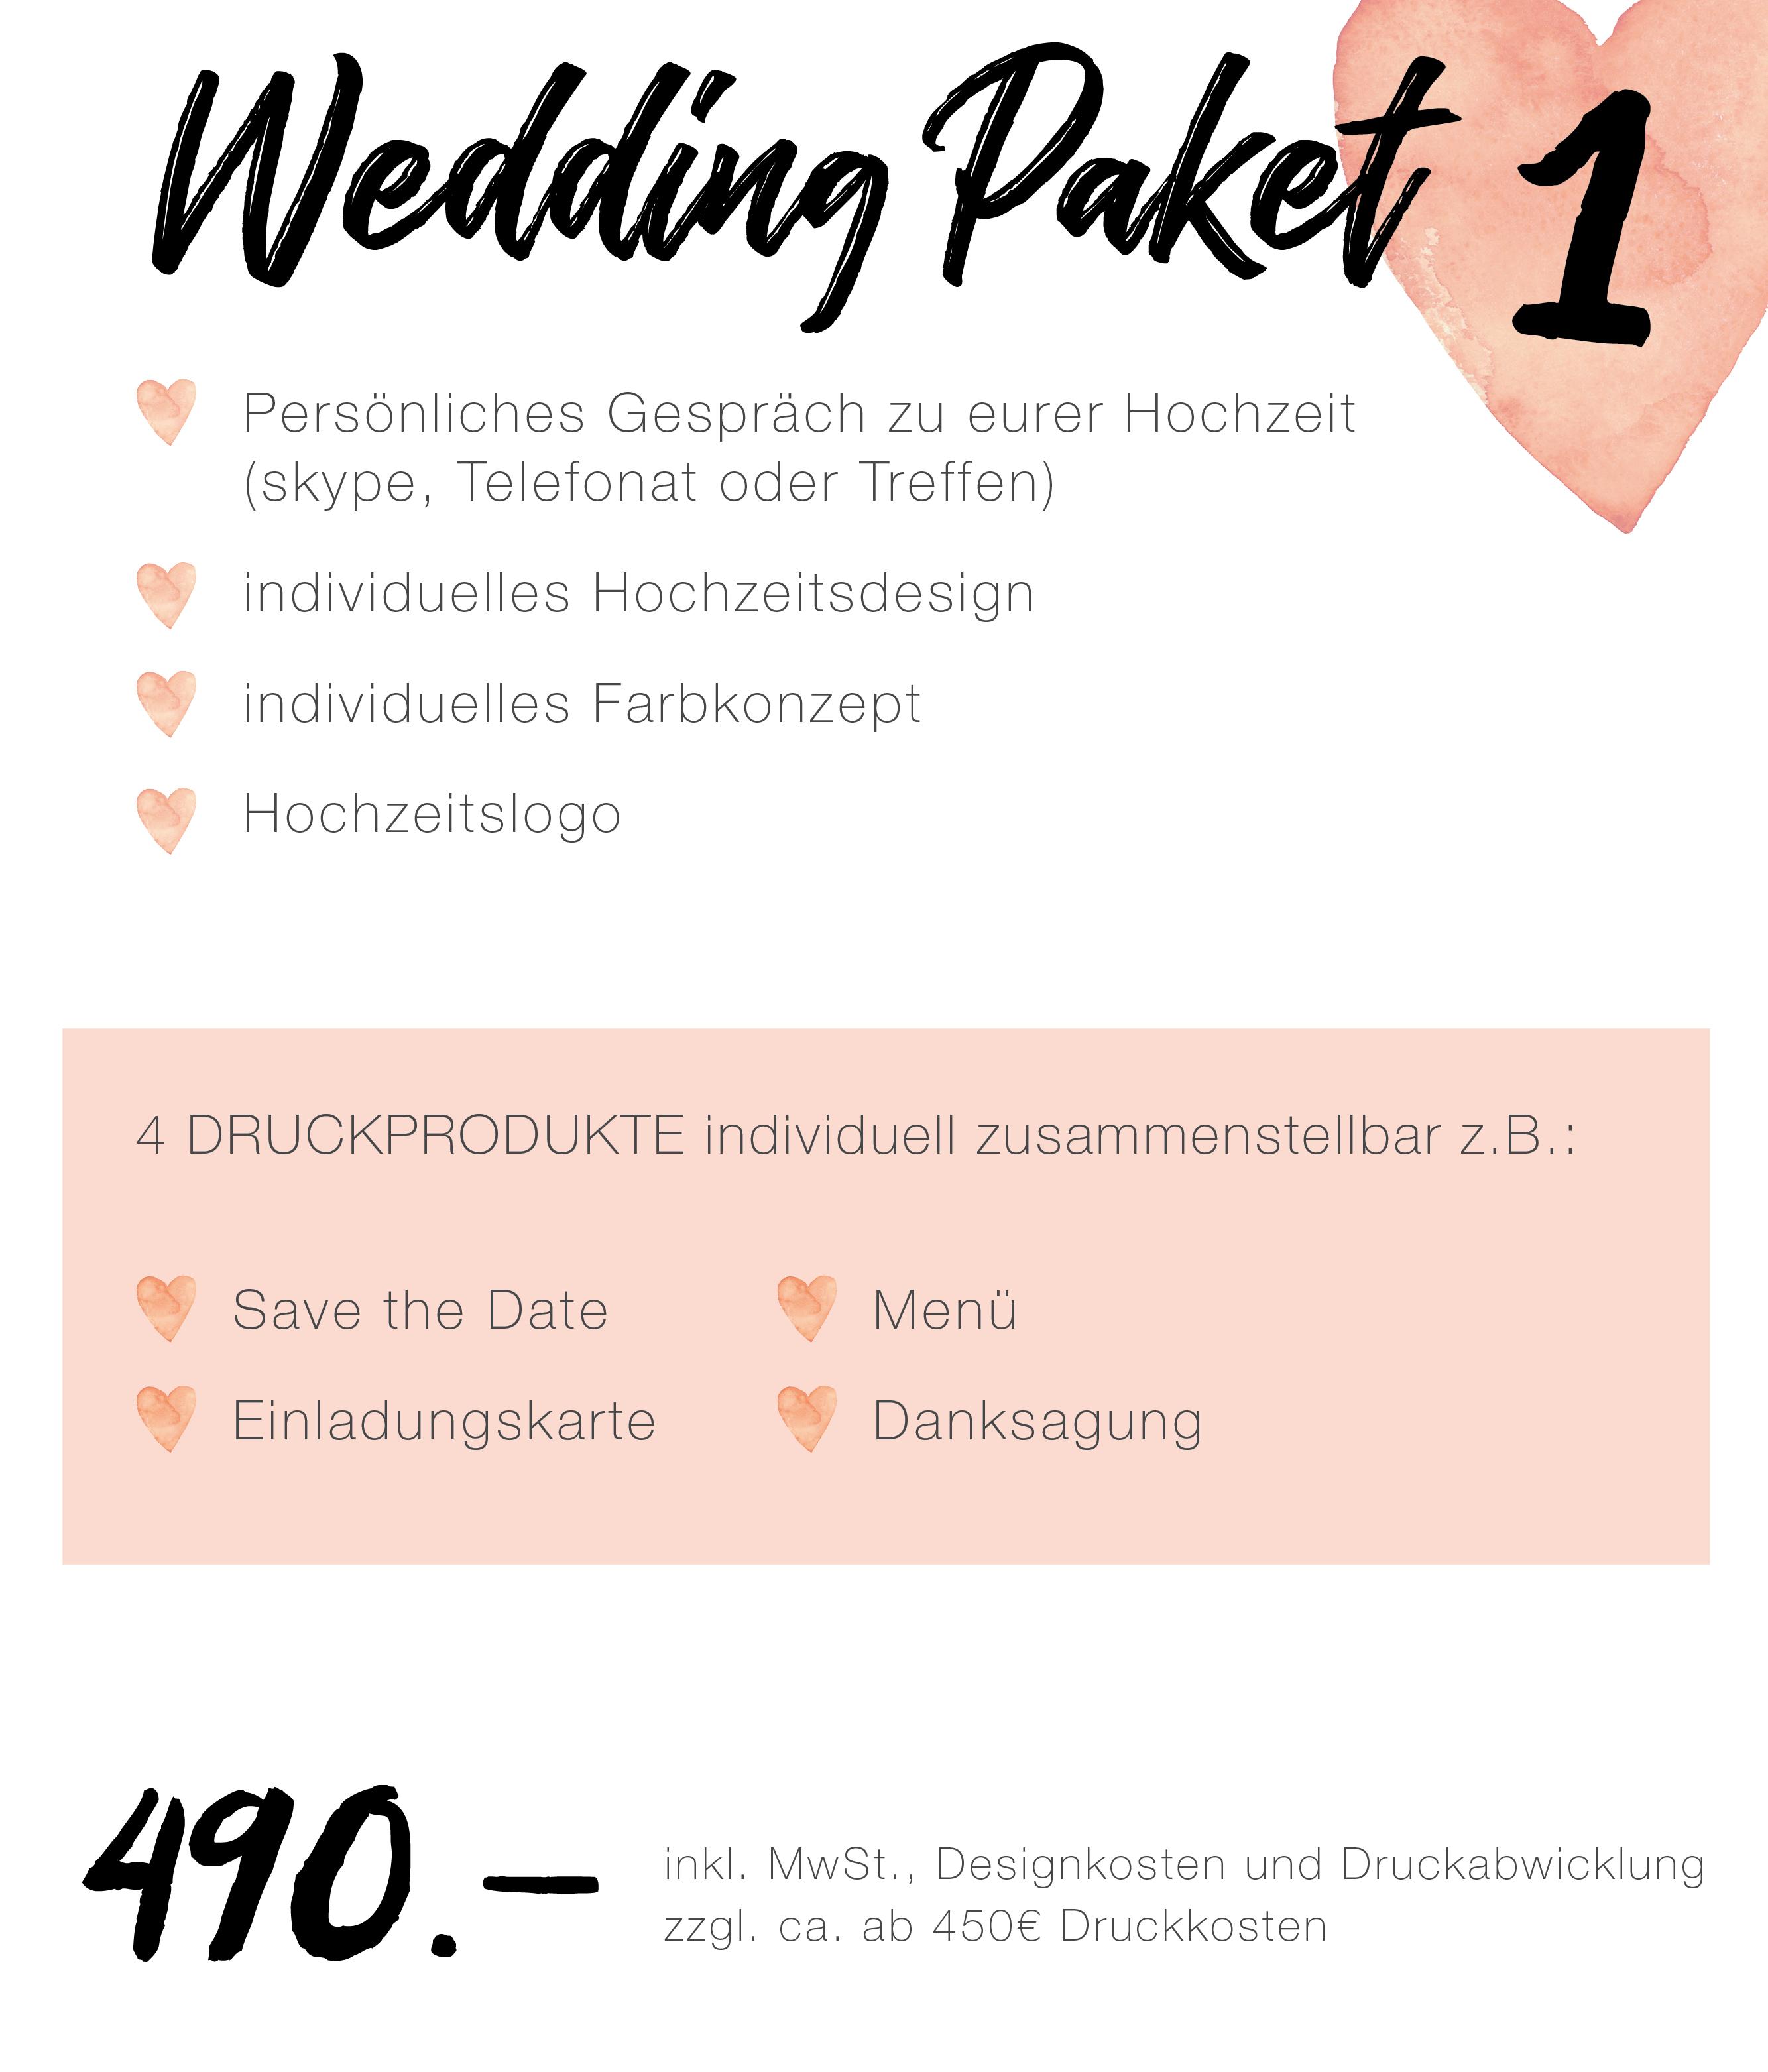 confettiandcream wedding paket 1